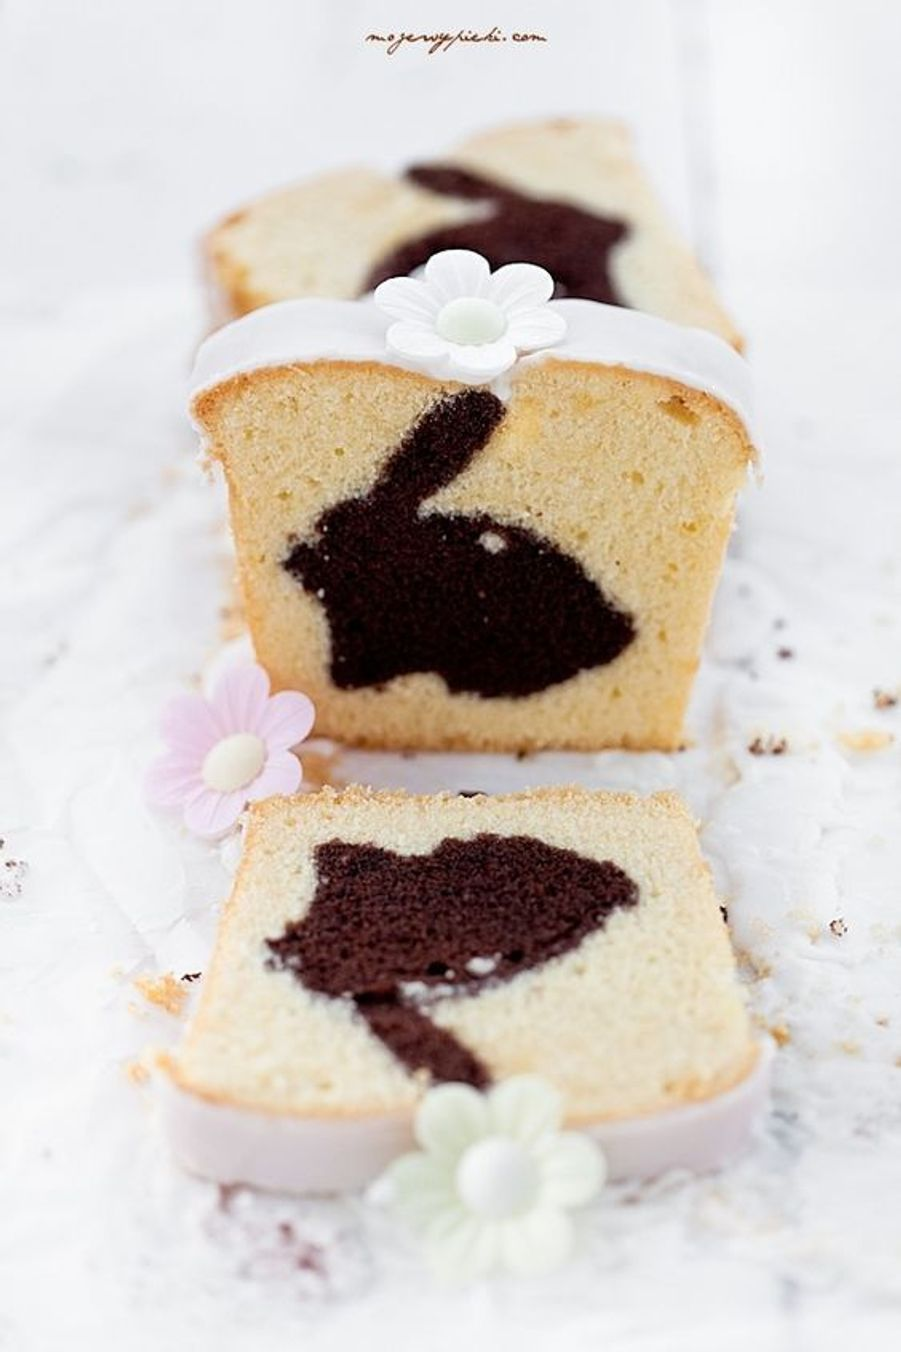 Gâteau avec surprise lapinhttps://www.pinterest.fr/pin/519391769501742746/